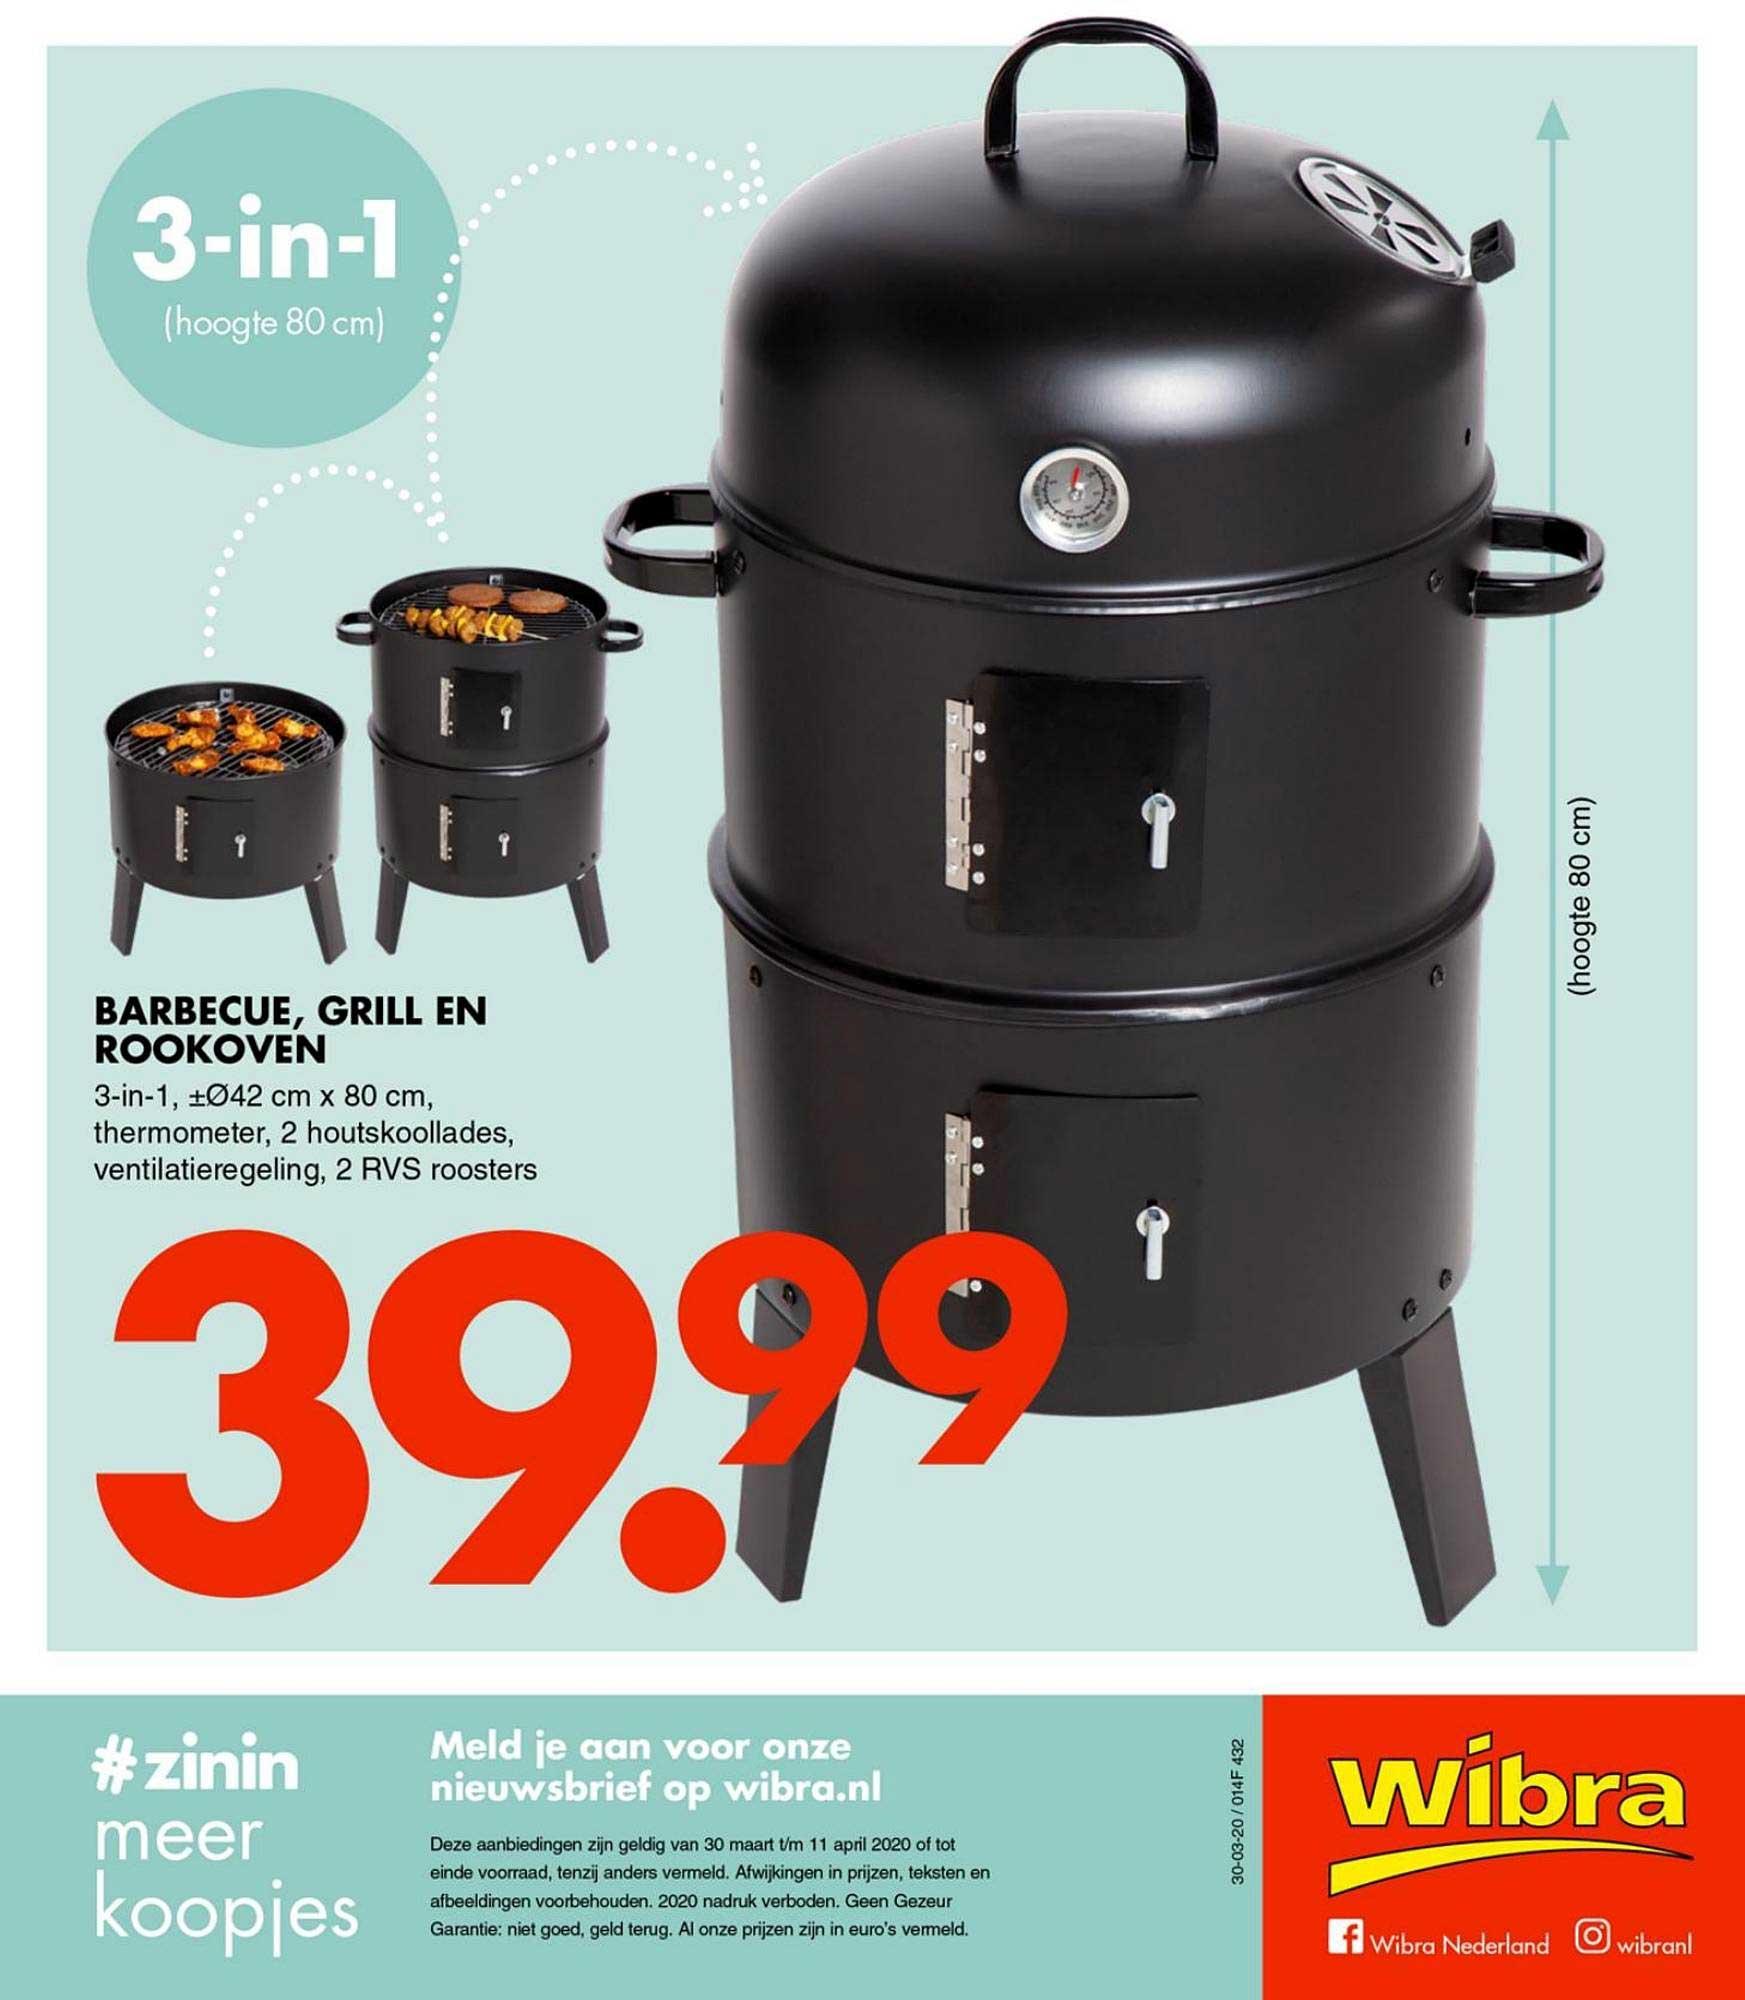 Wibra Barbecue, Grill En Rookoven